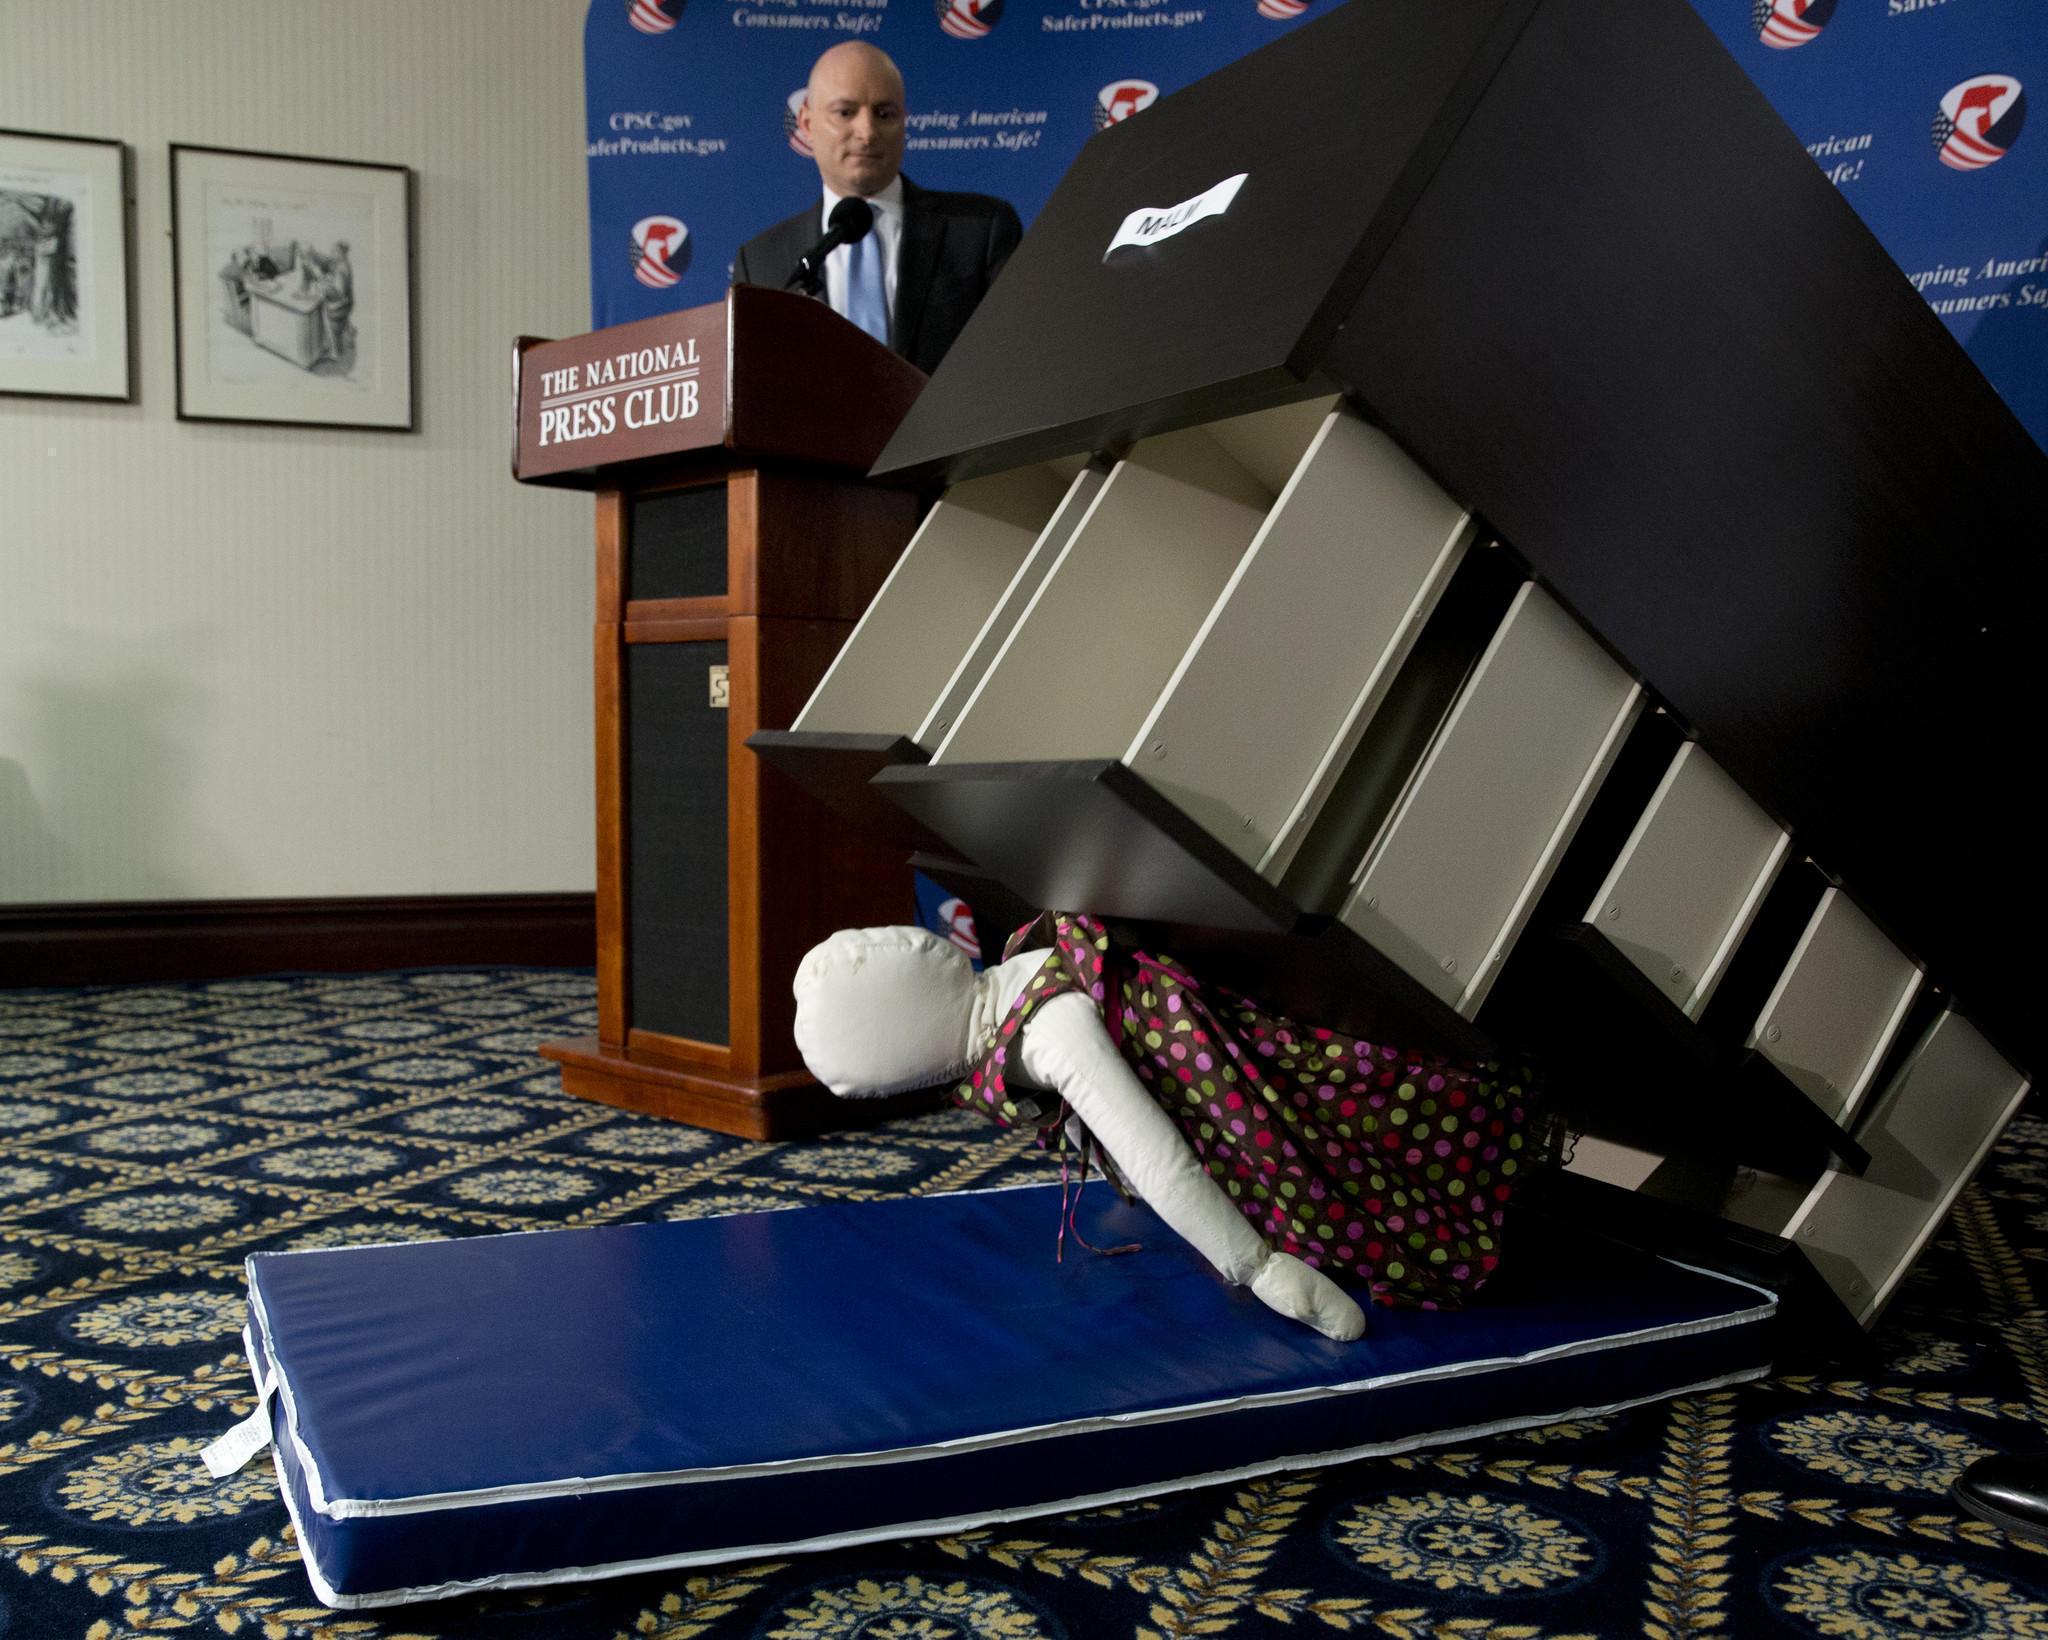 Ikea recalls 29 million dressers after 6 children are killed